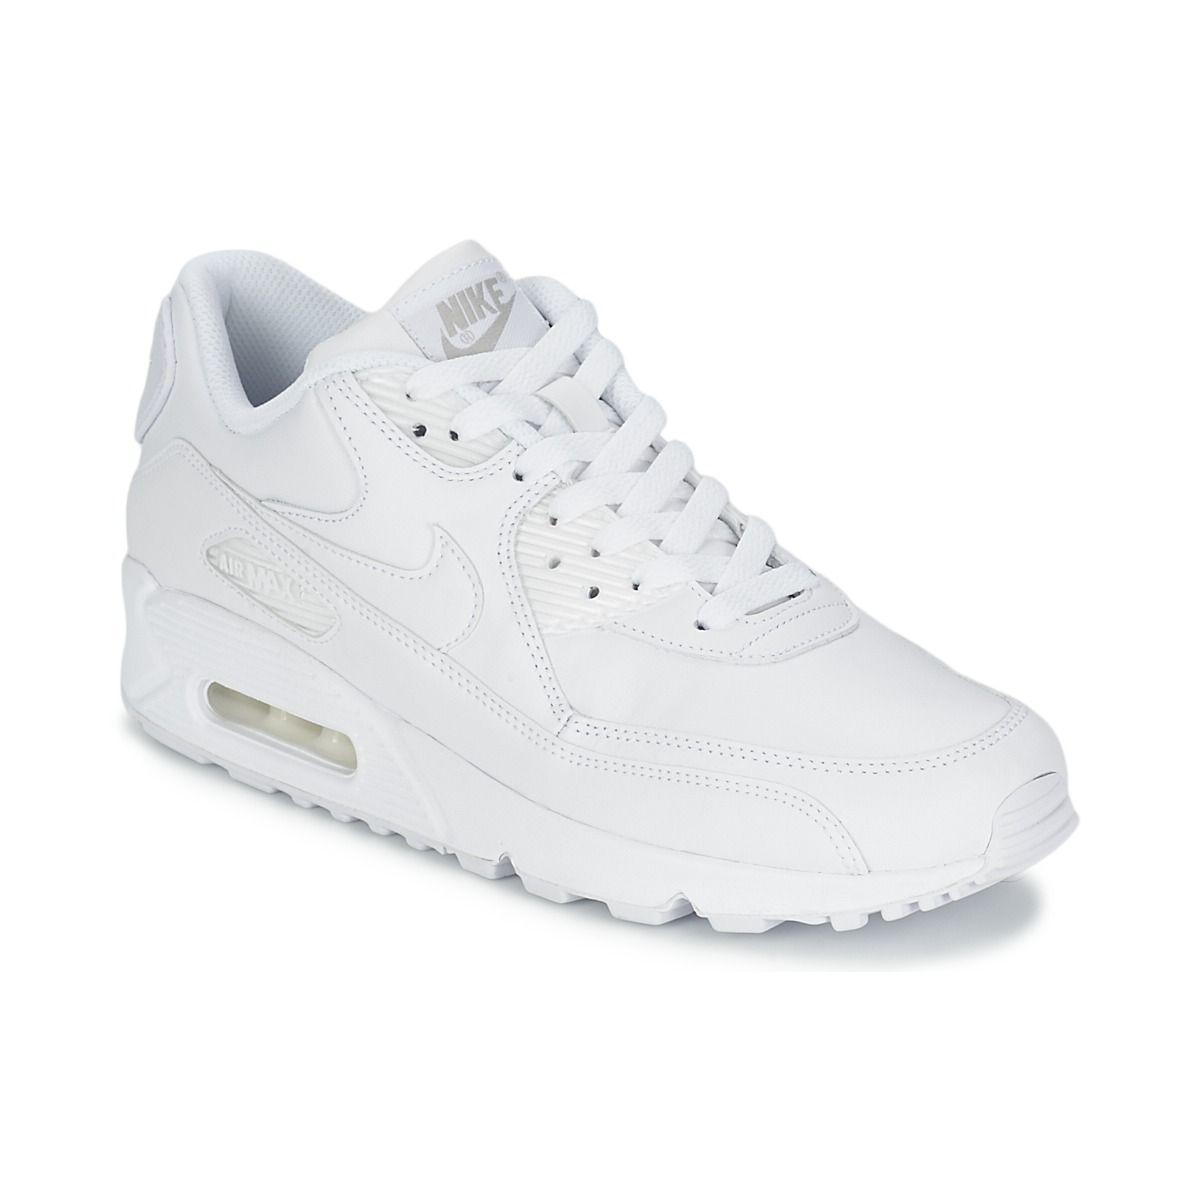 nike sportswear air max 90 essential - baskets basses - blanc